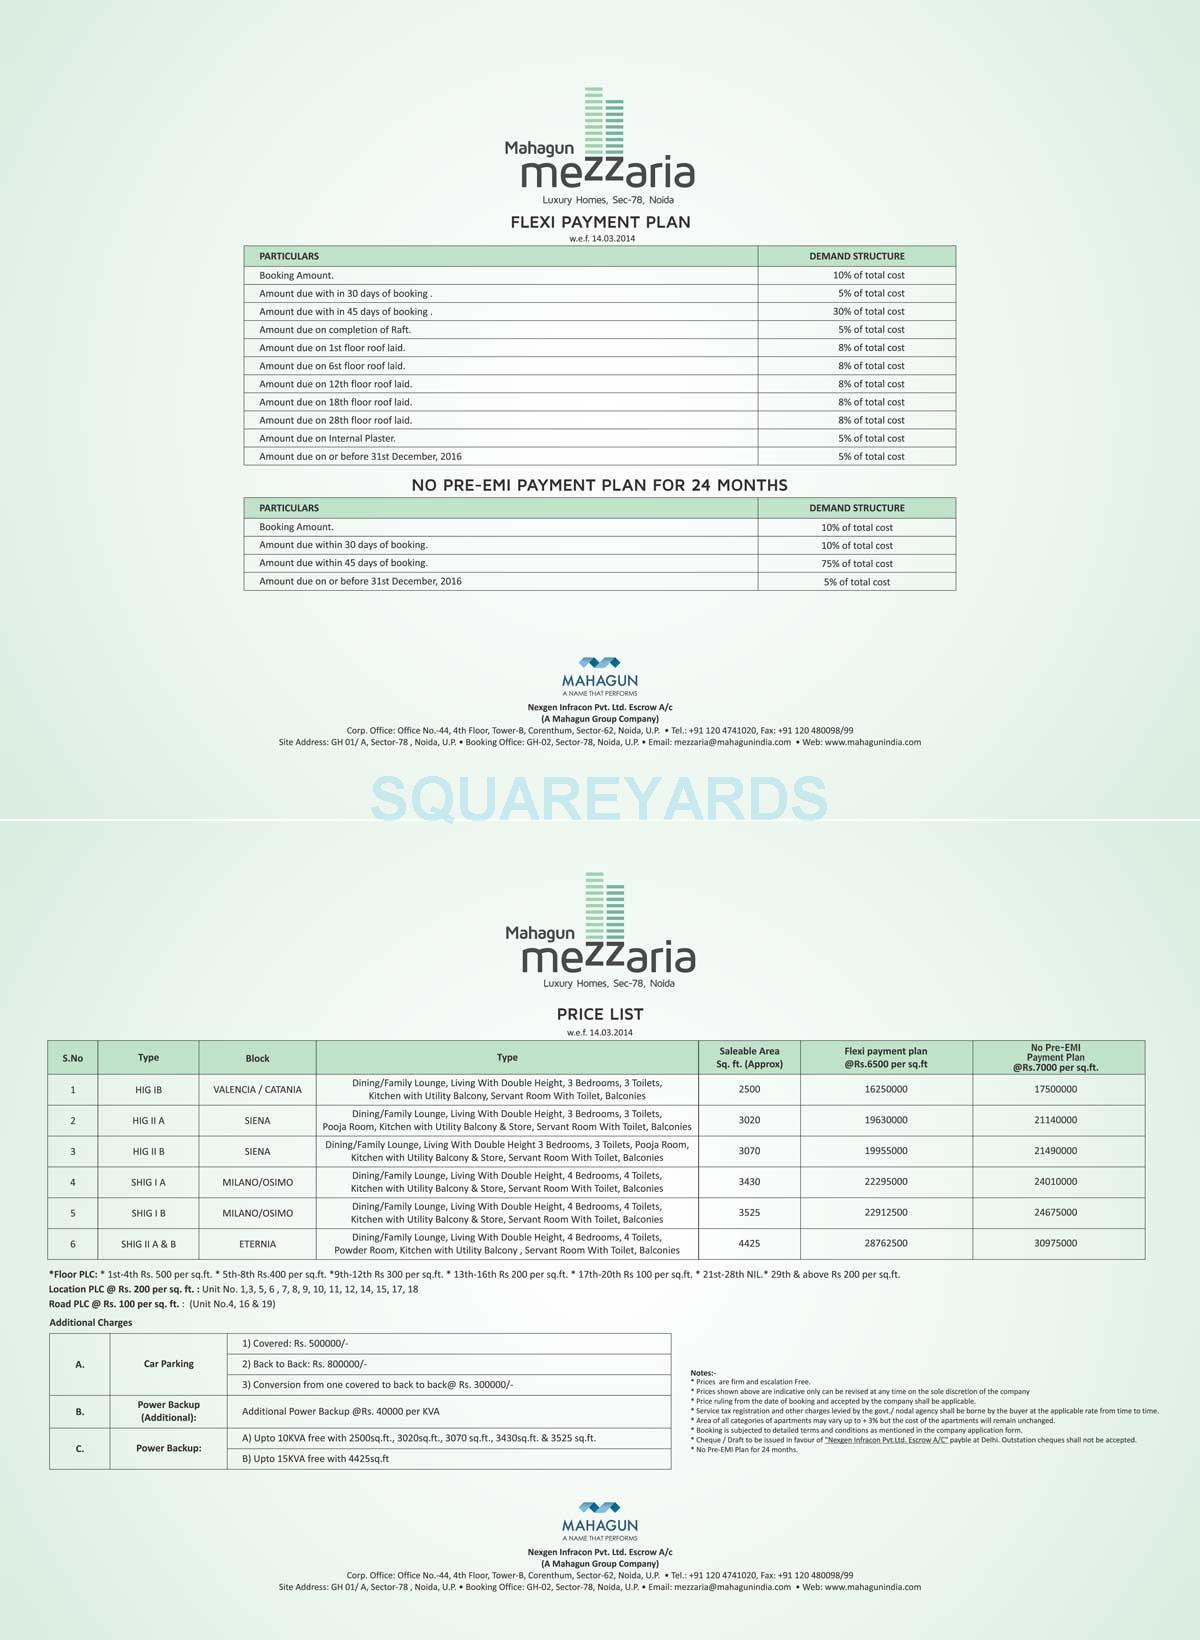 mahagun mezzaria payment plan image1